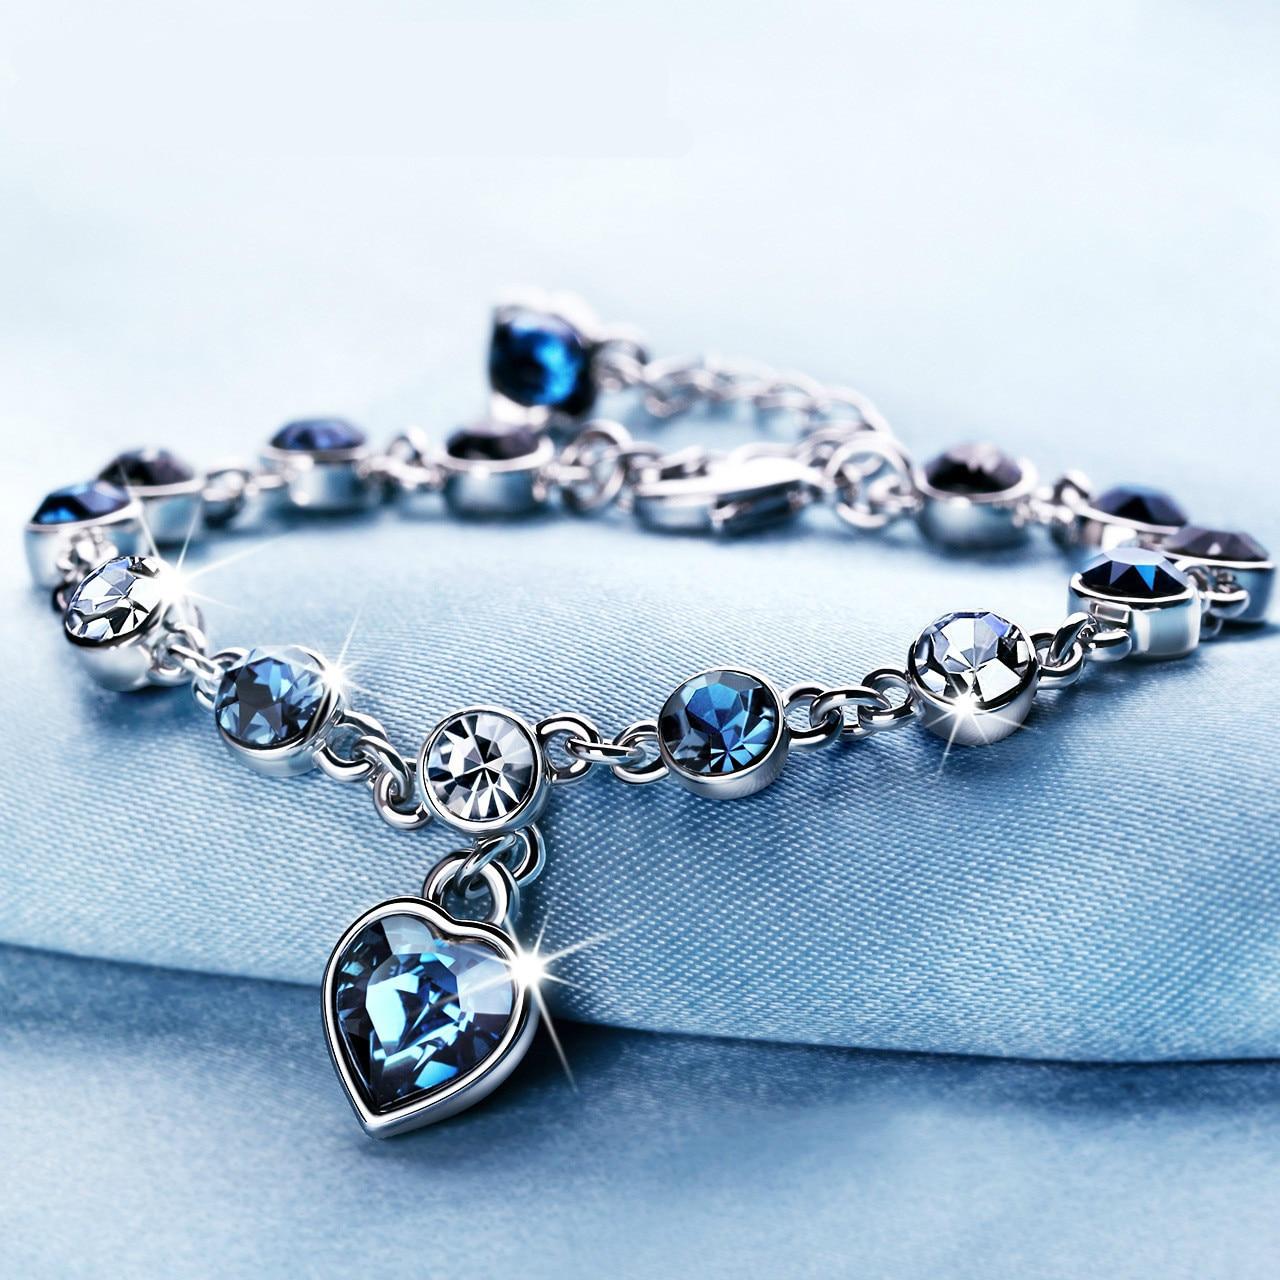 Silver Color Sapphire Bracelet For Women Romantic Heart-shaped Blue Jewelry Pulseira Feminina Kehribar Bizuteria Bracelet